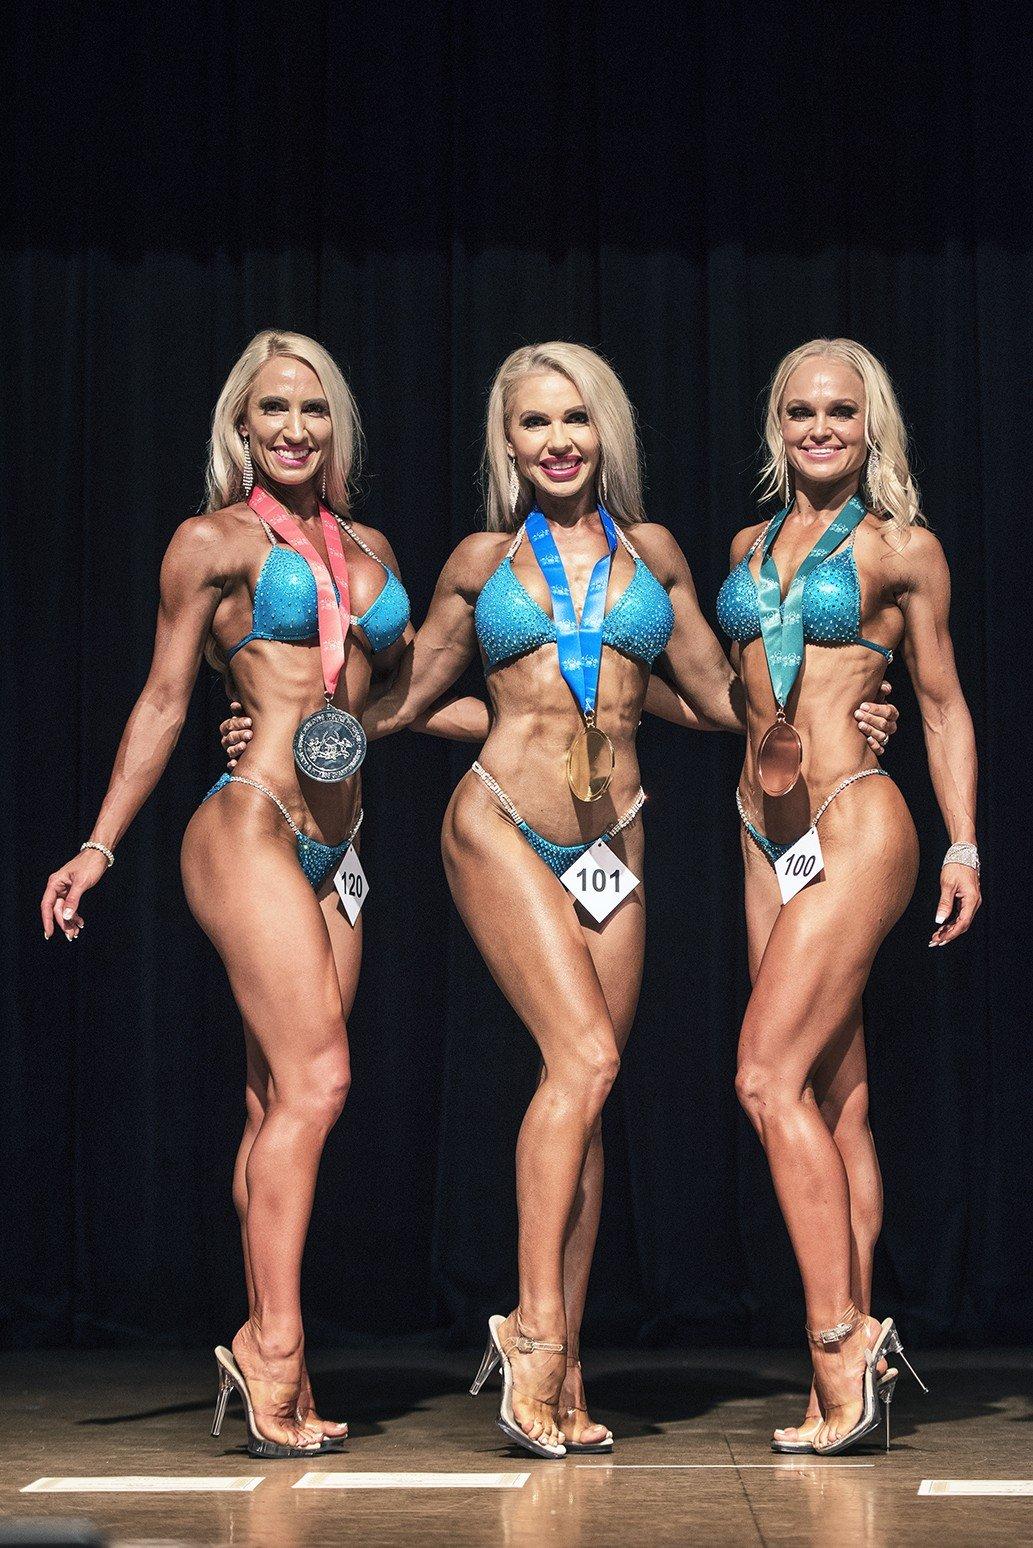 PHOTOS & VIDEO: 2018 IFBB Australasian Championships